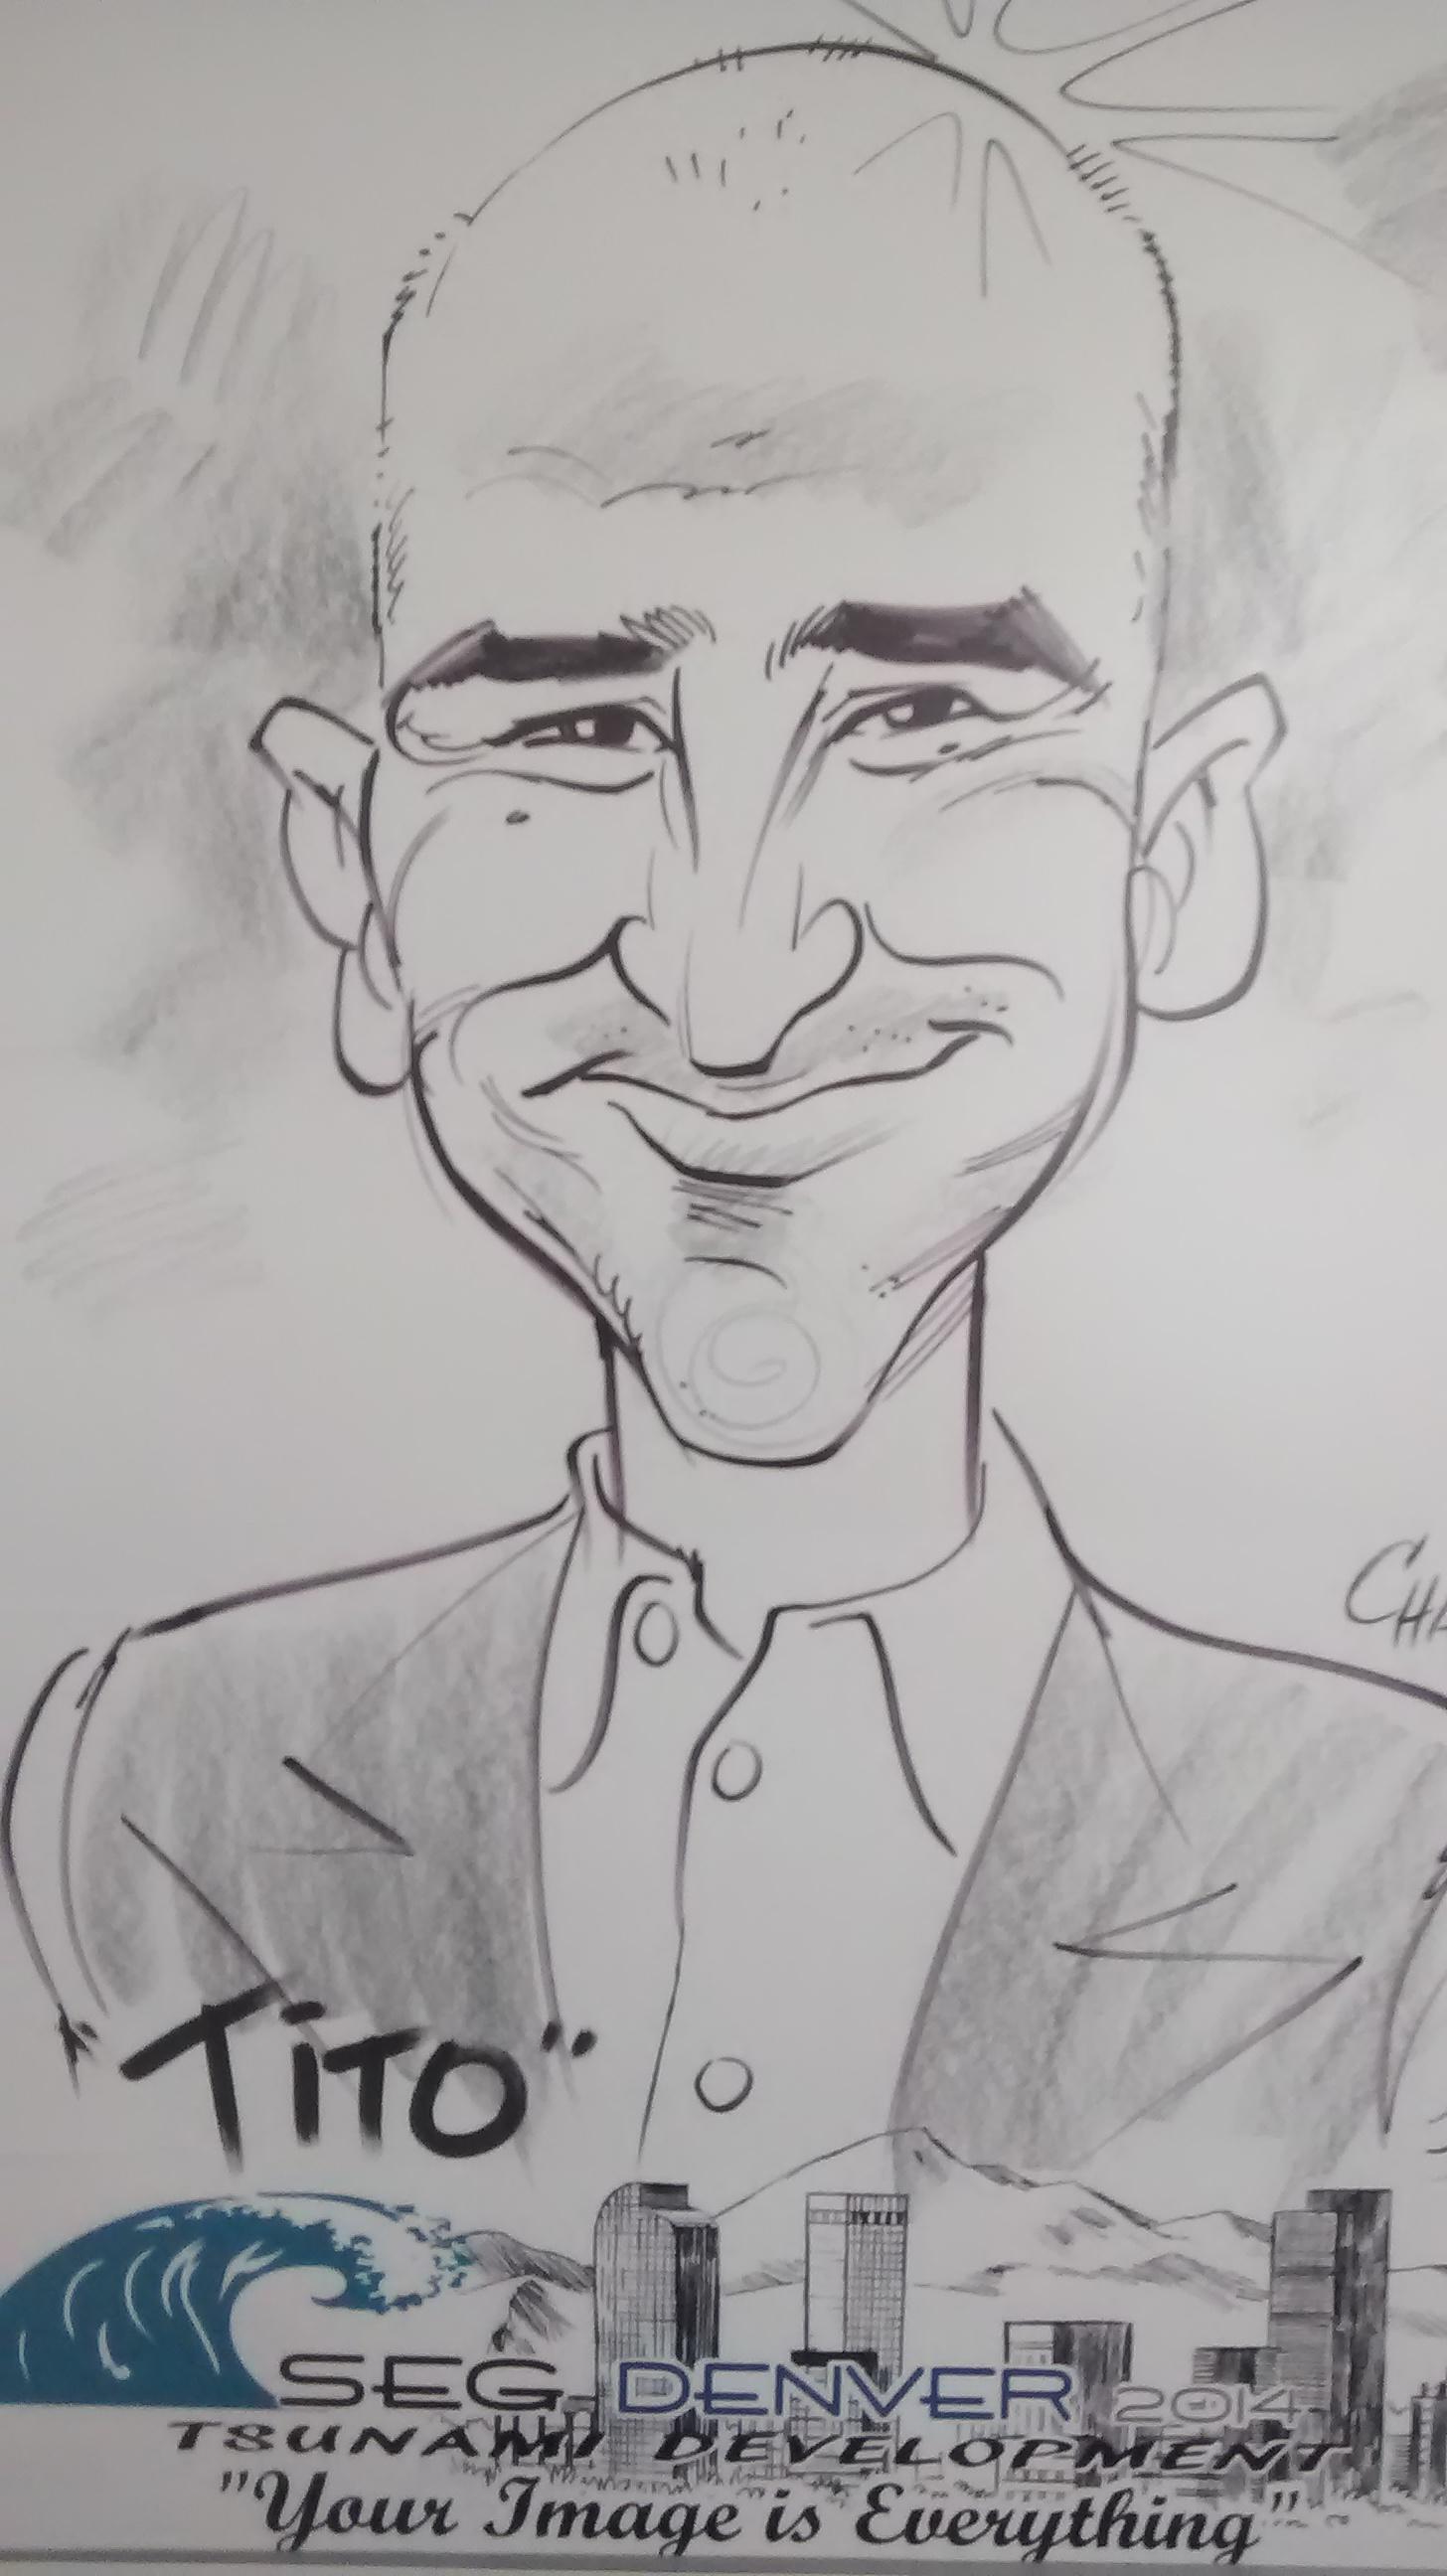 Tito Duval - Denver SEG